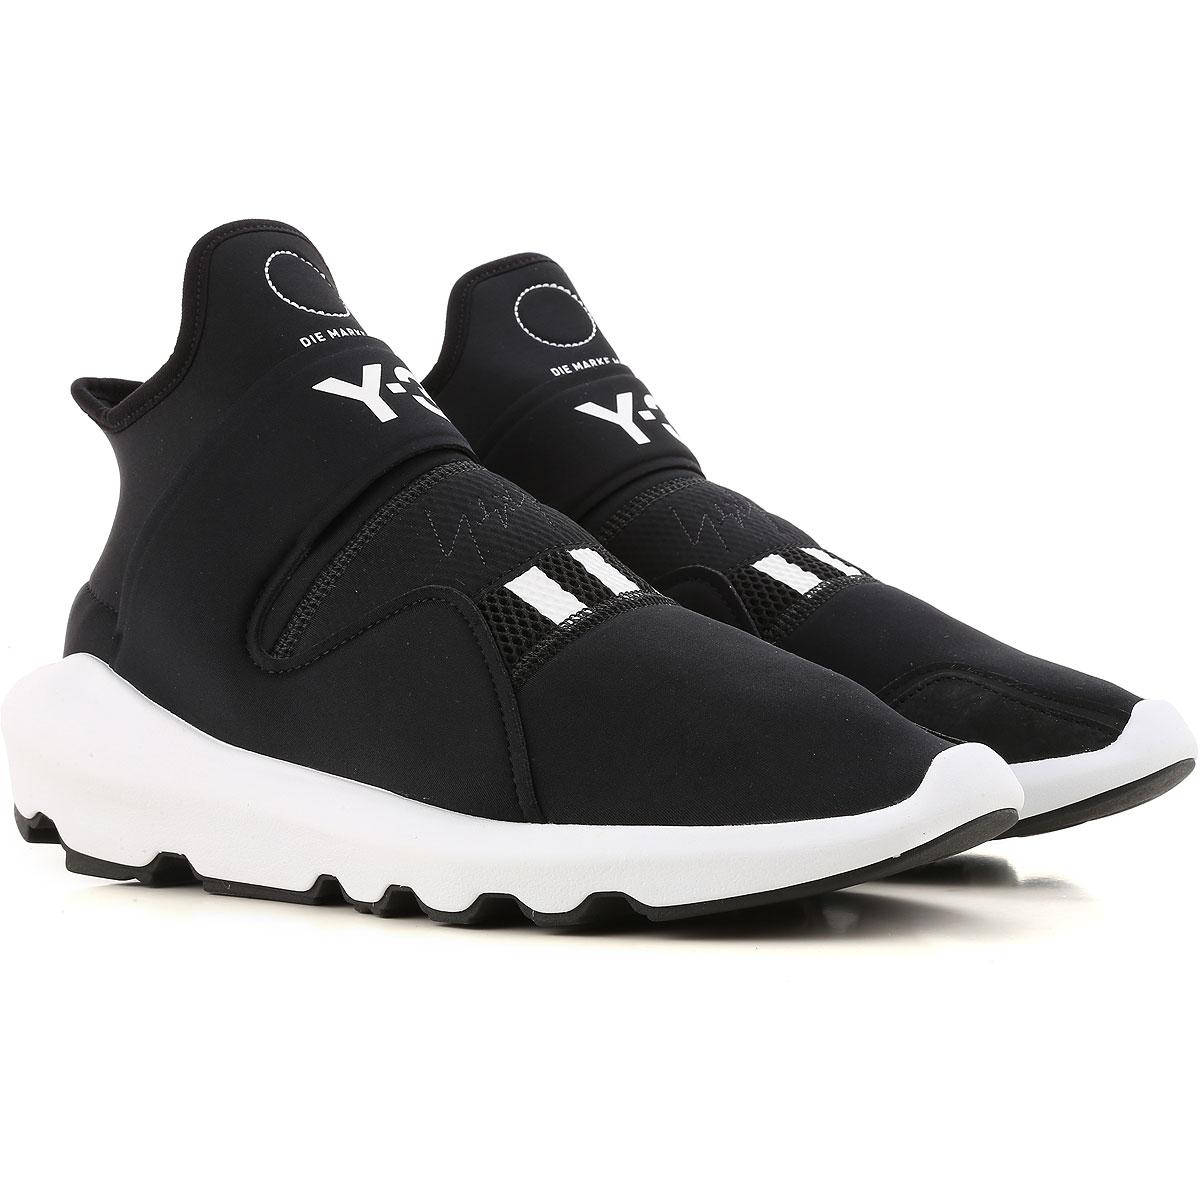 Image of Adidas Mens Shoes, Y3 Edition, Black, Fabric, 2017, 10 10.5 11 11.5 6 7 7.5 8 8.5 9 9.5